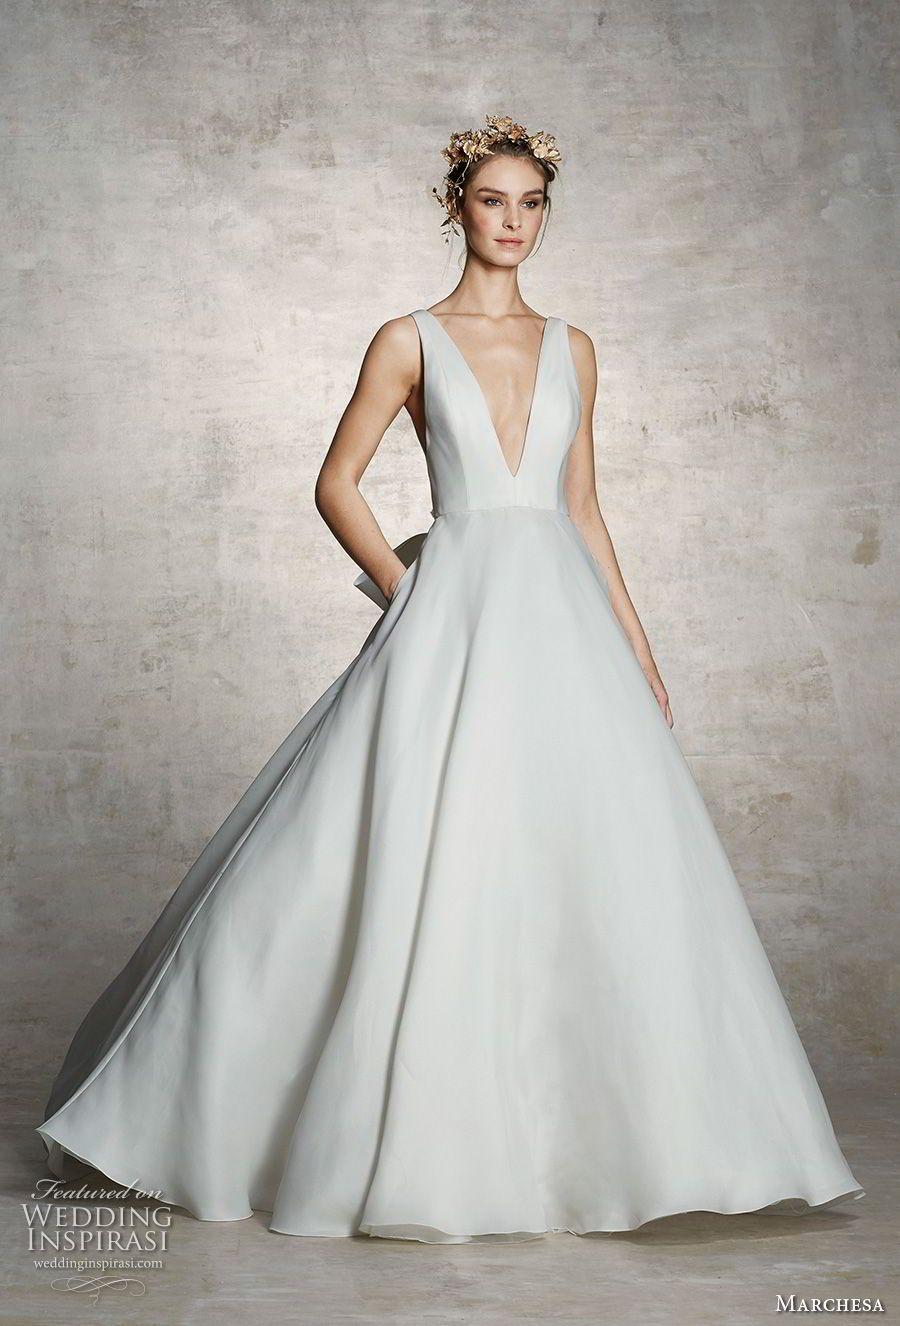 Marchesa Spring 2019 Wedding Dresses Wedding Inspirasi Marchesa Bridal Wedding Dress With Pockets Marchesa Wedding Dress [ 1326 x 900 Pixel ]